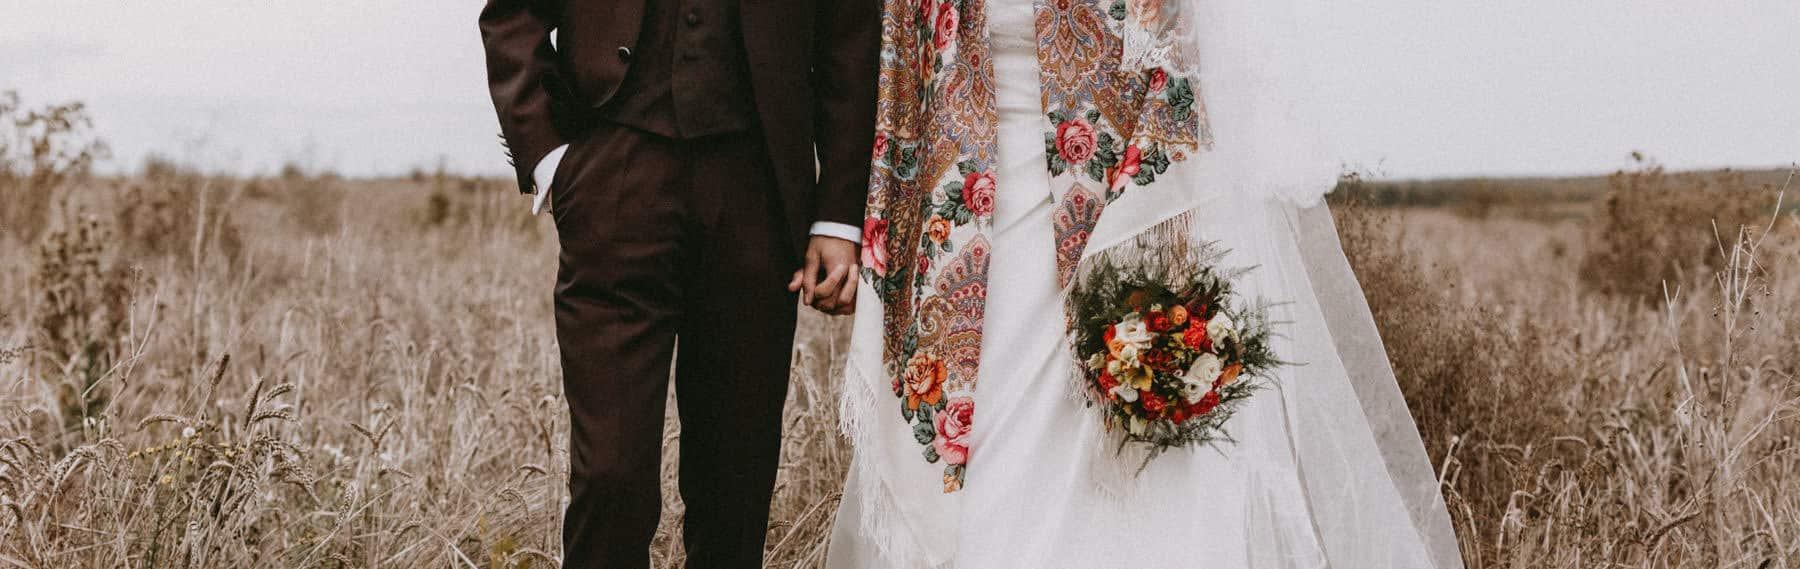 photographe mariage Autigny-la-Tour